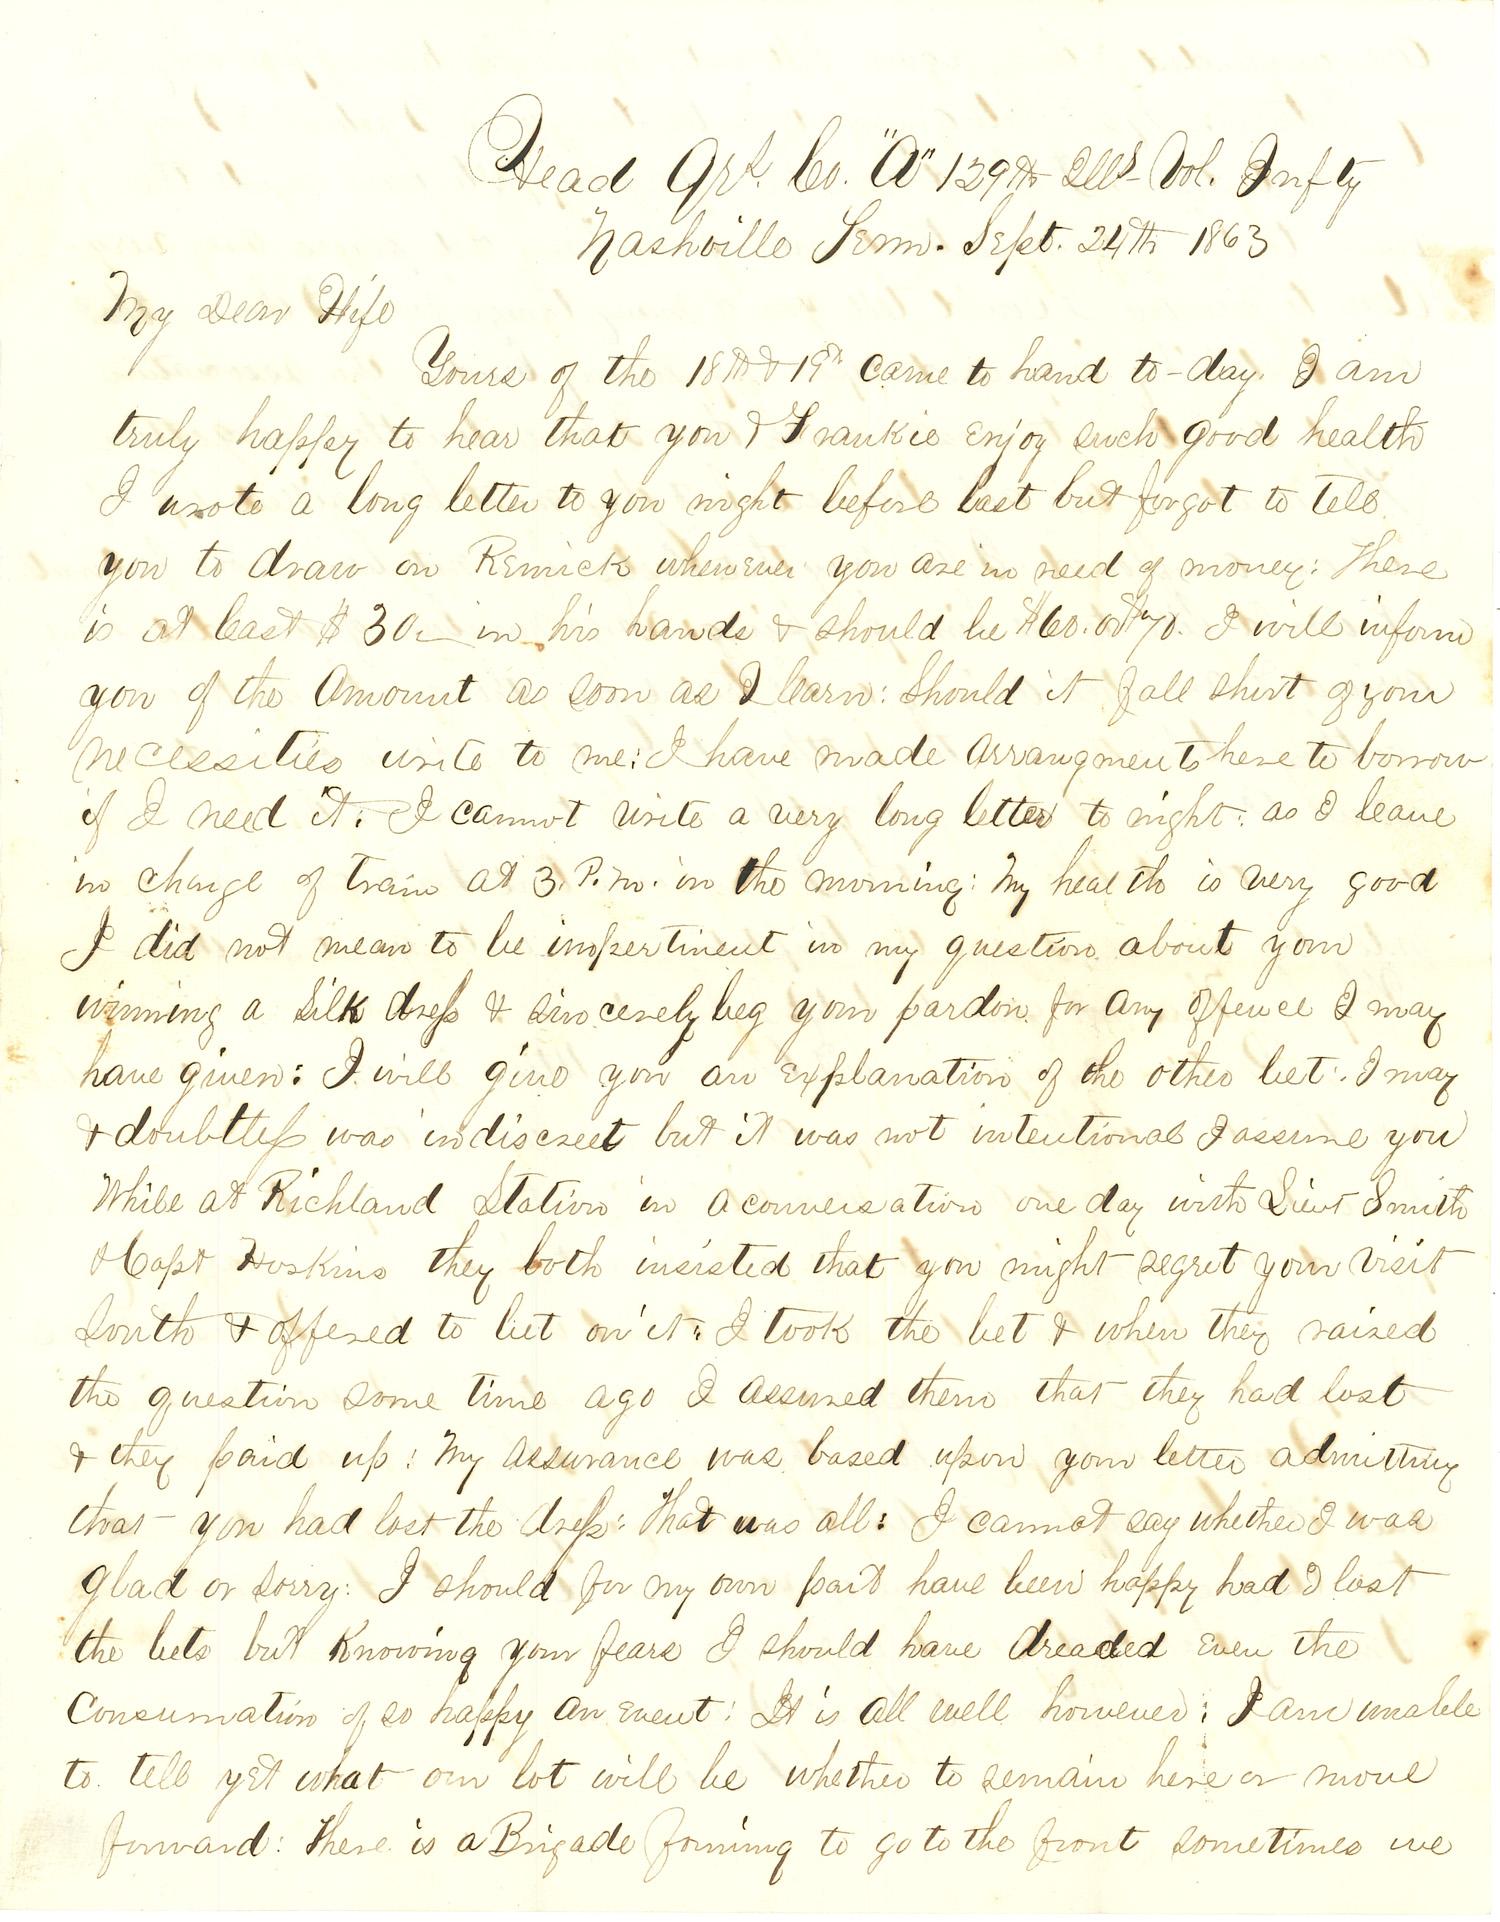 Joseph Culver Letter, September 24, 1863, Page 1